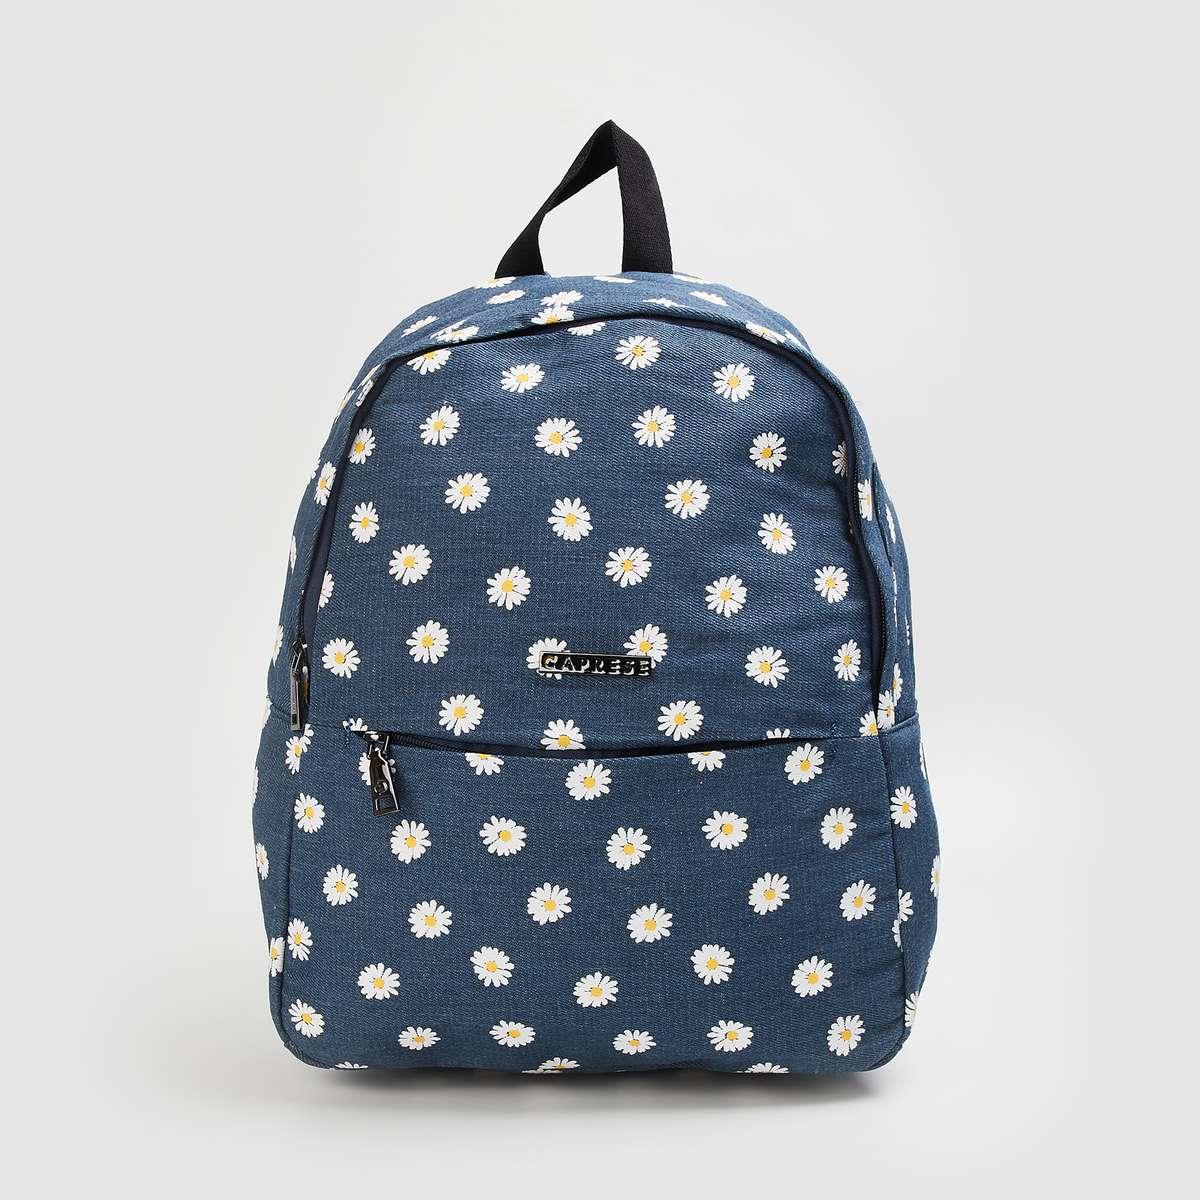 2.CAPRESE Women Printed Backpack